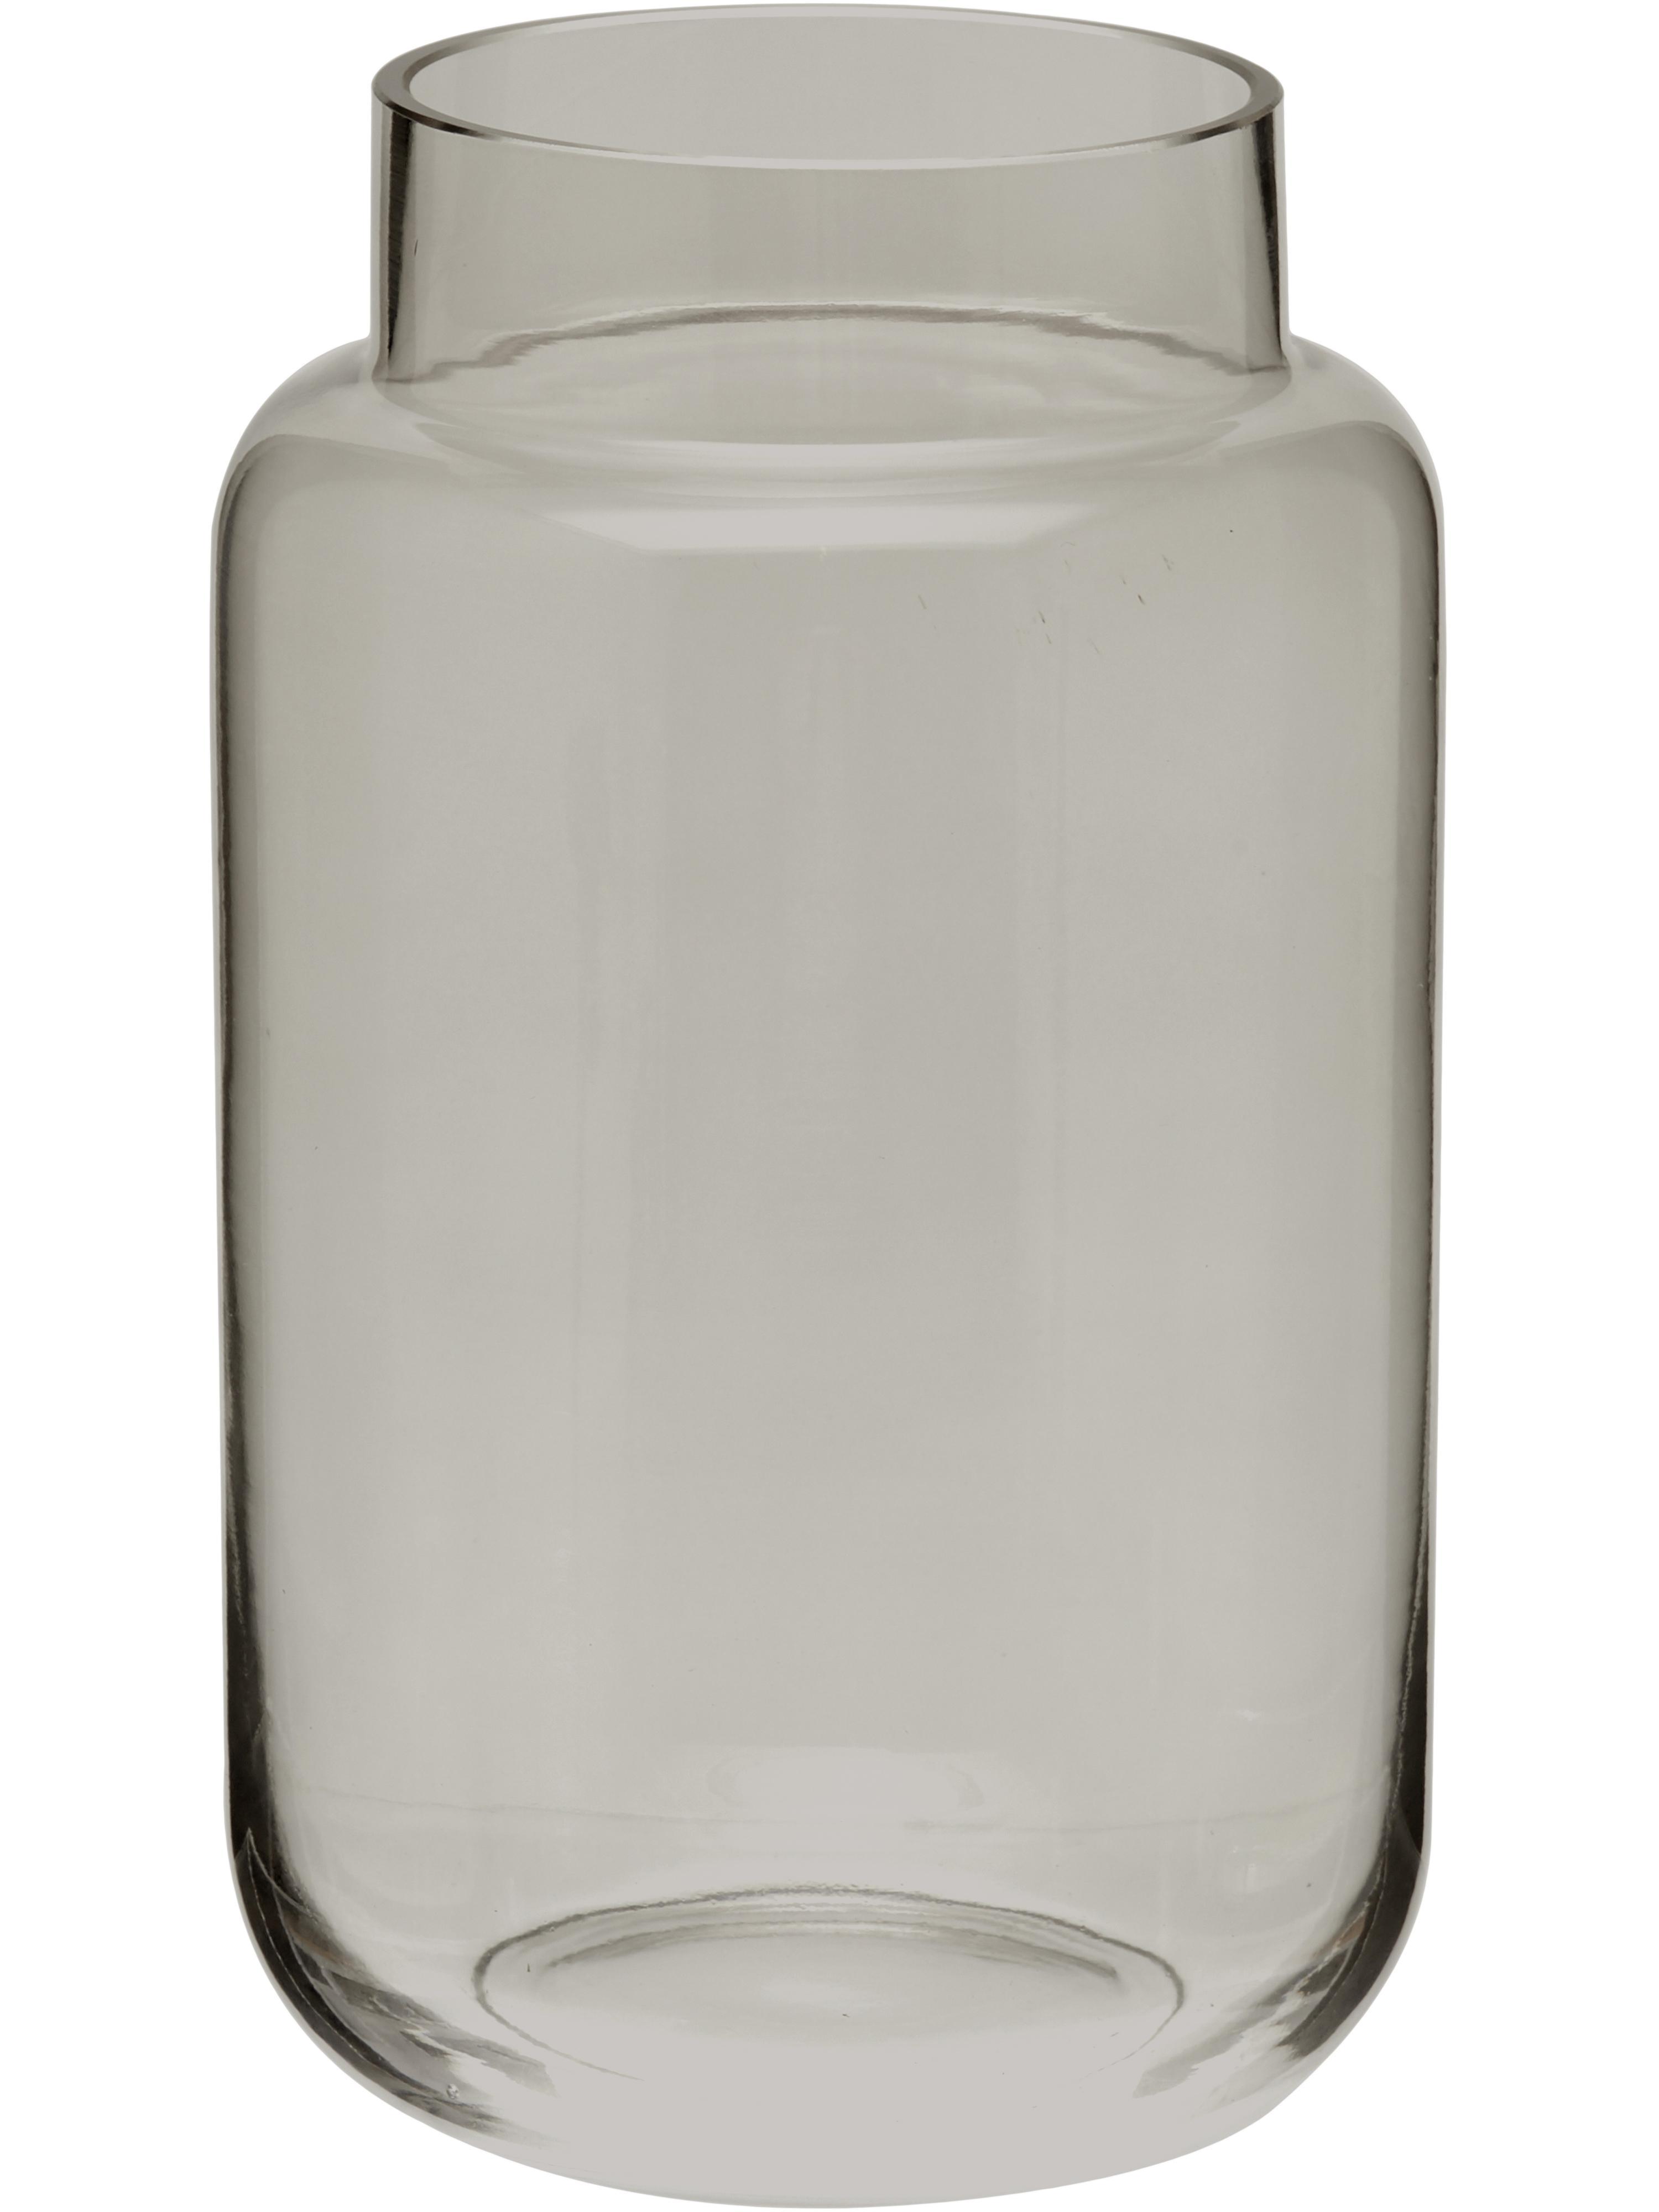 Glas-Vase Lasse, gross, Glas, Grau, transparent, Ø 13 x H 22 cm